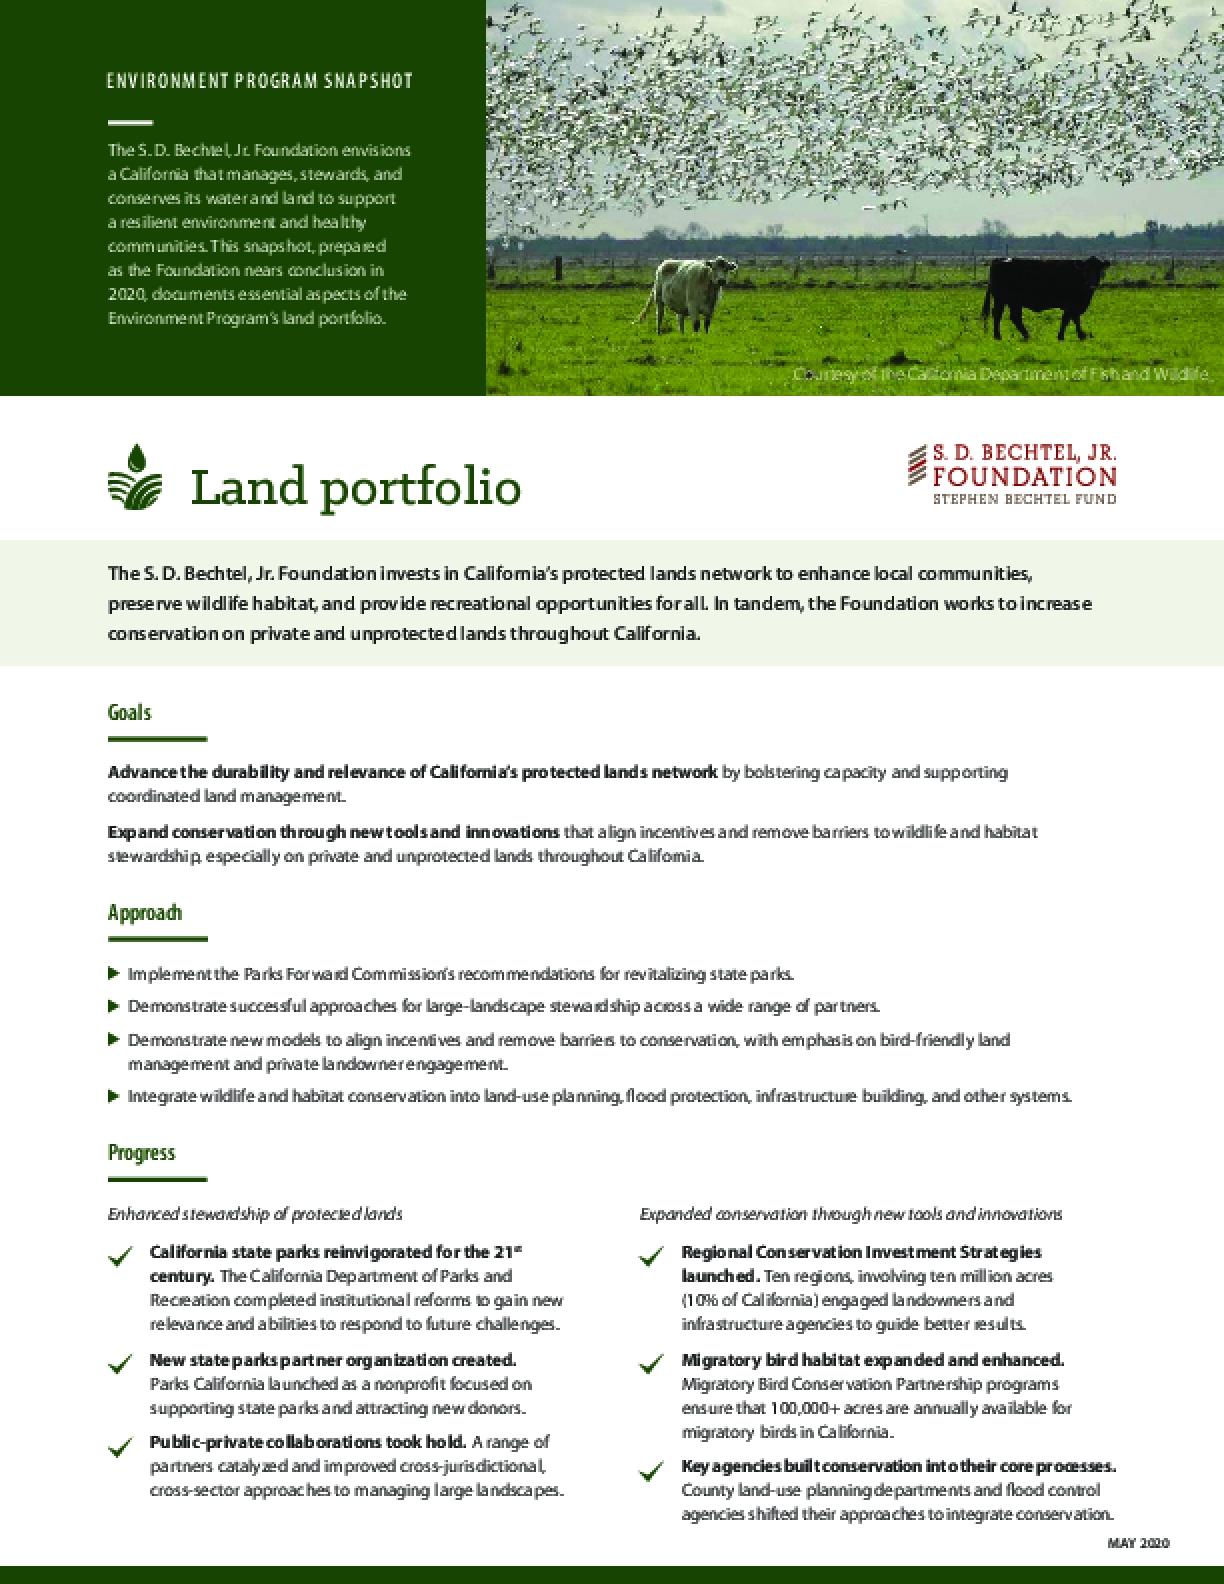 Environment Program Snapshot: Land Portfolio